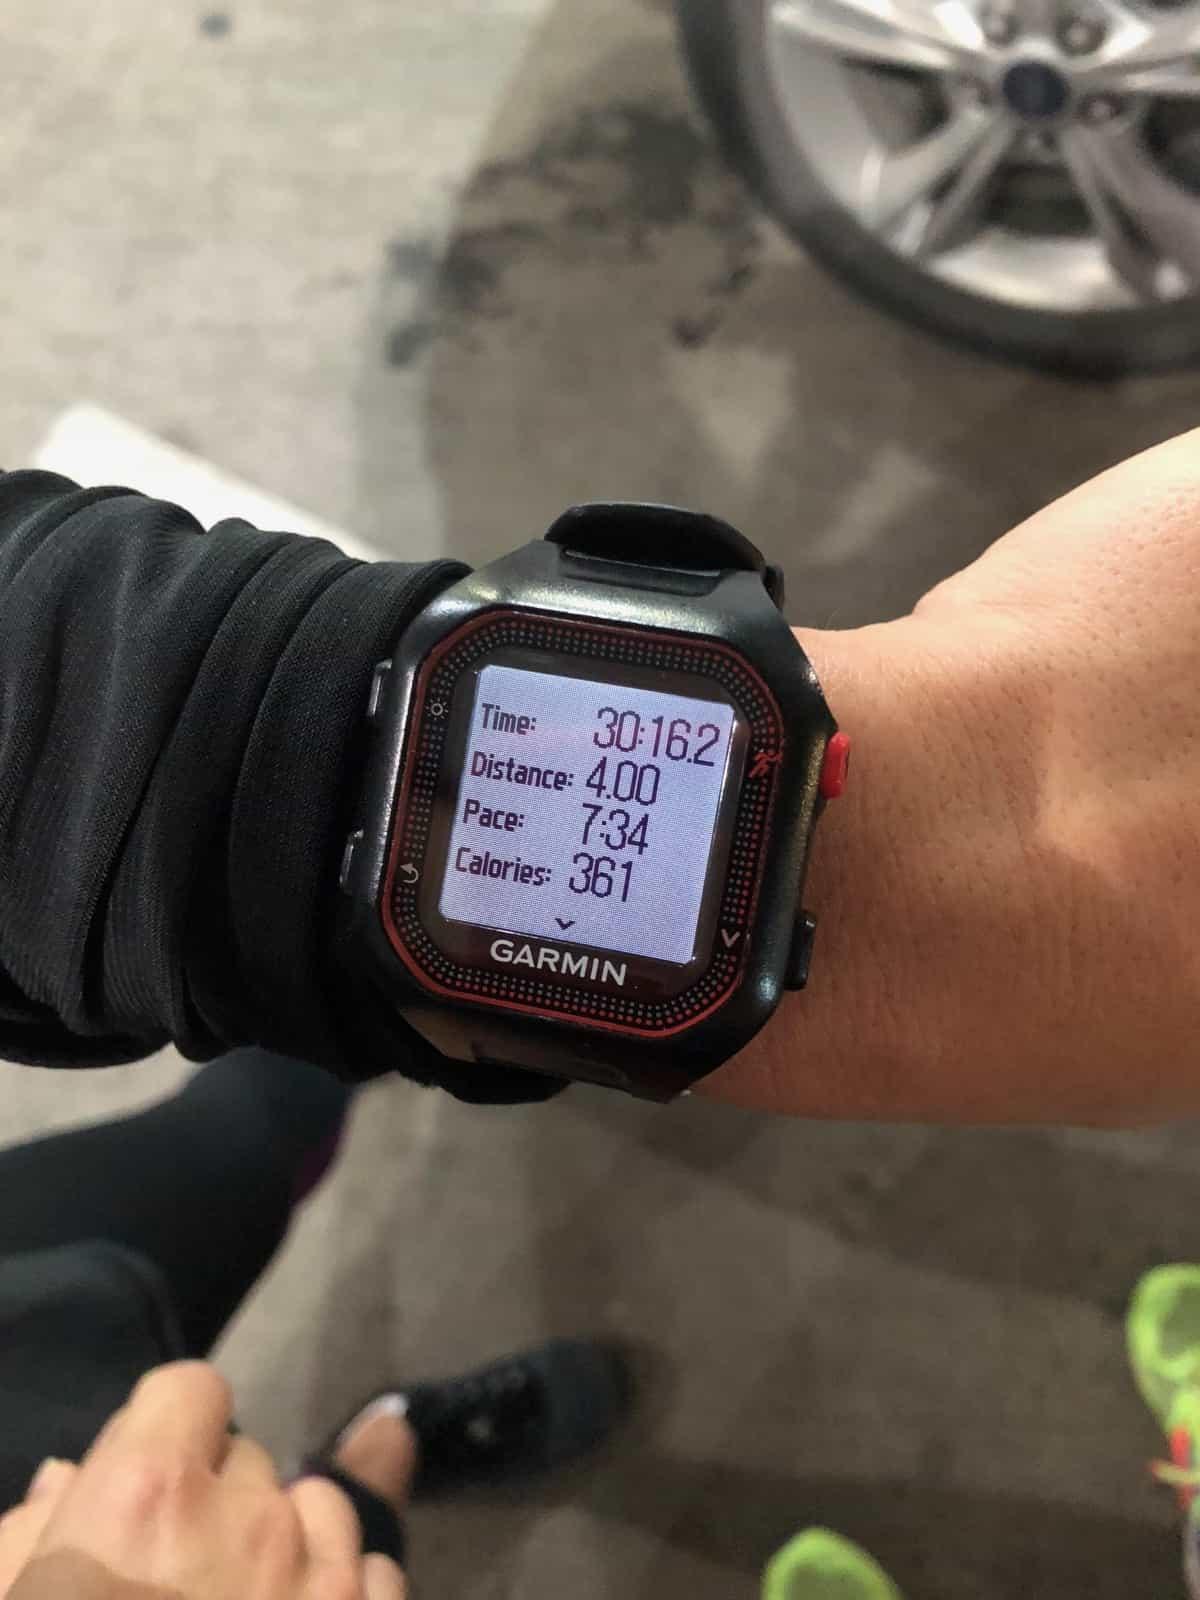 Running watch with a run recap on it